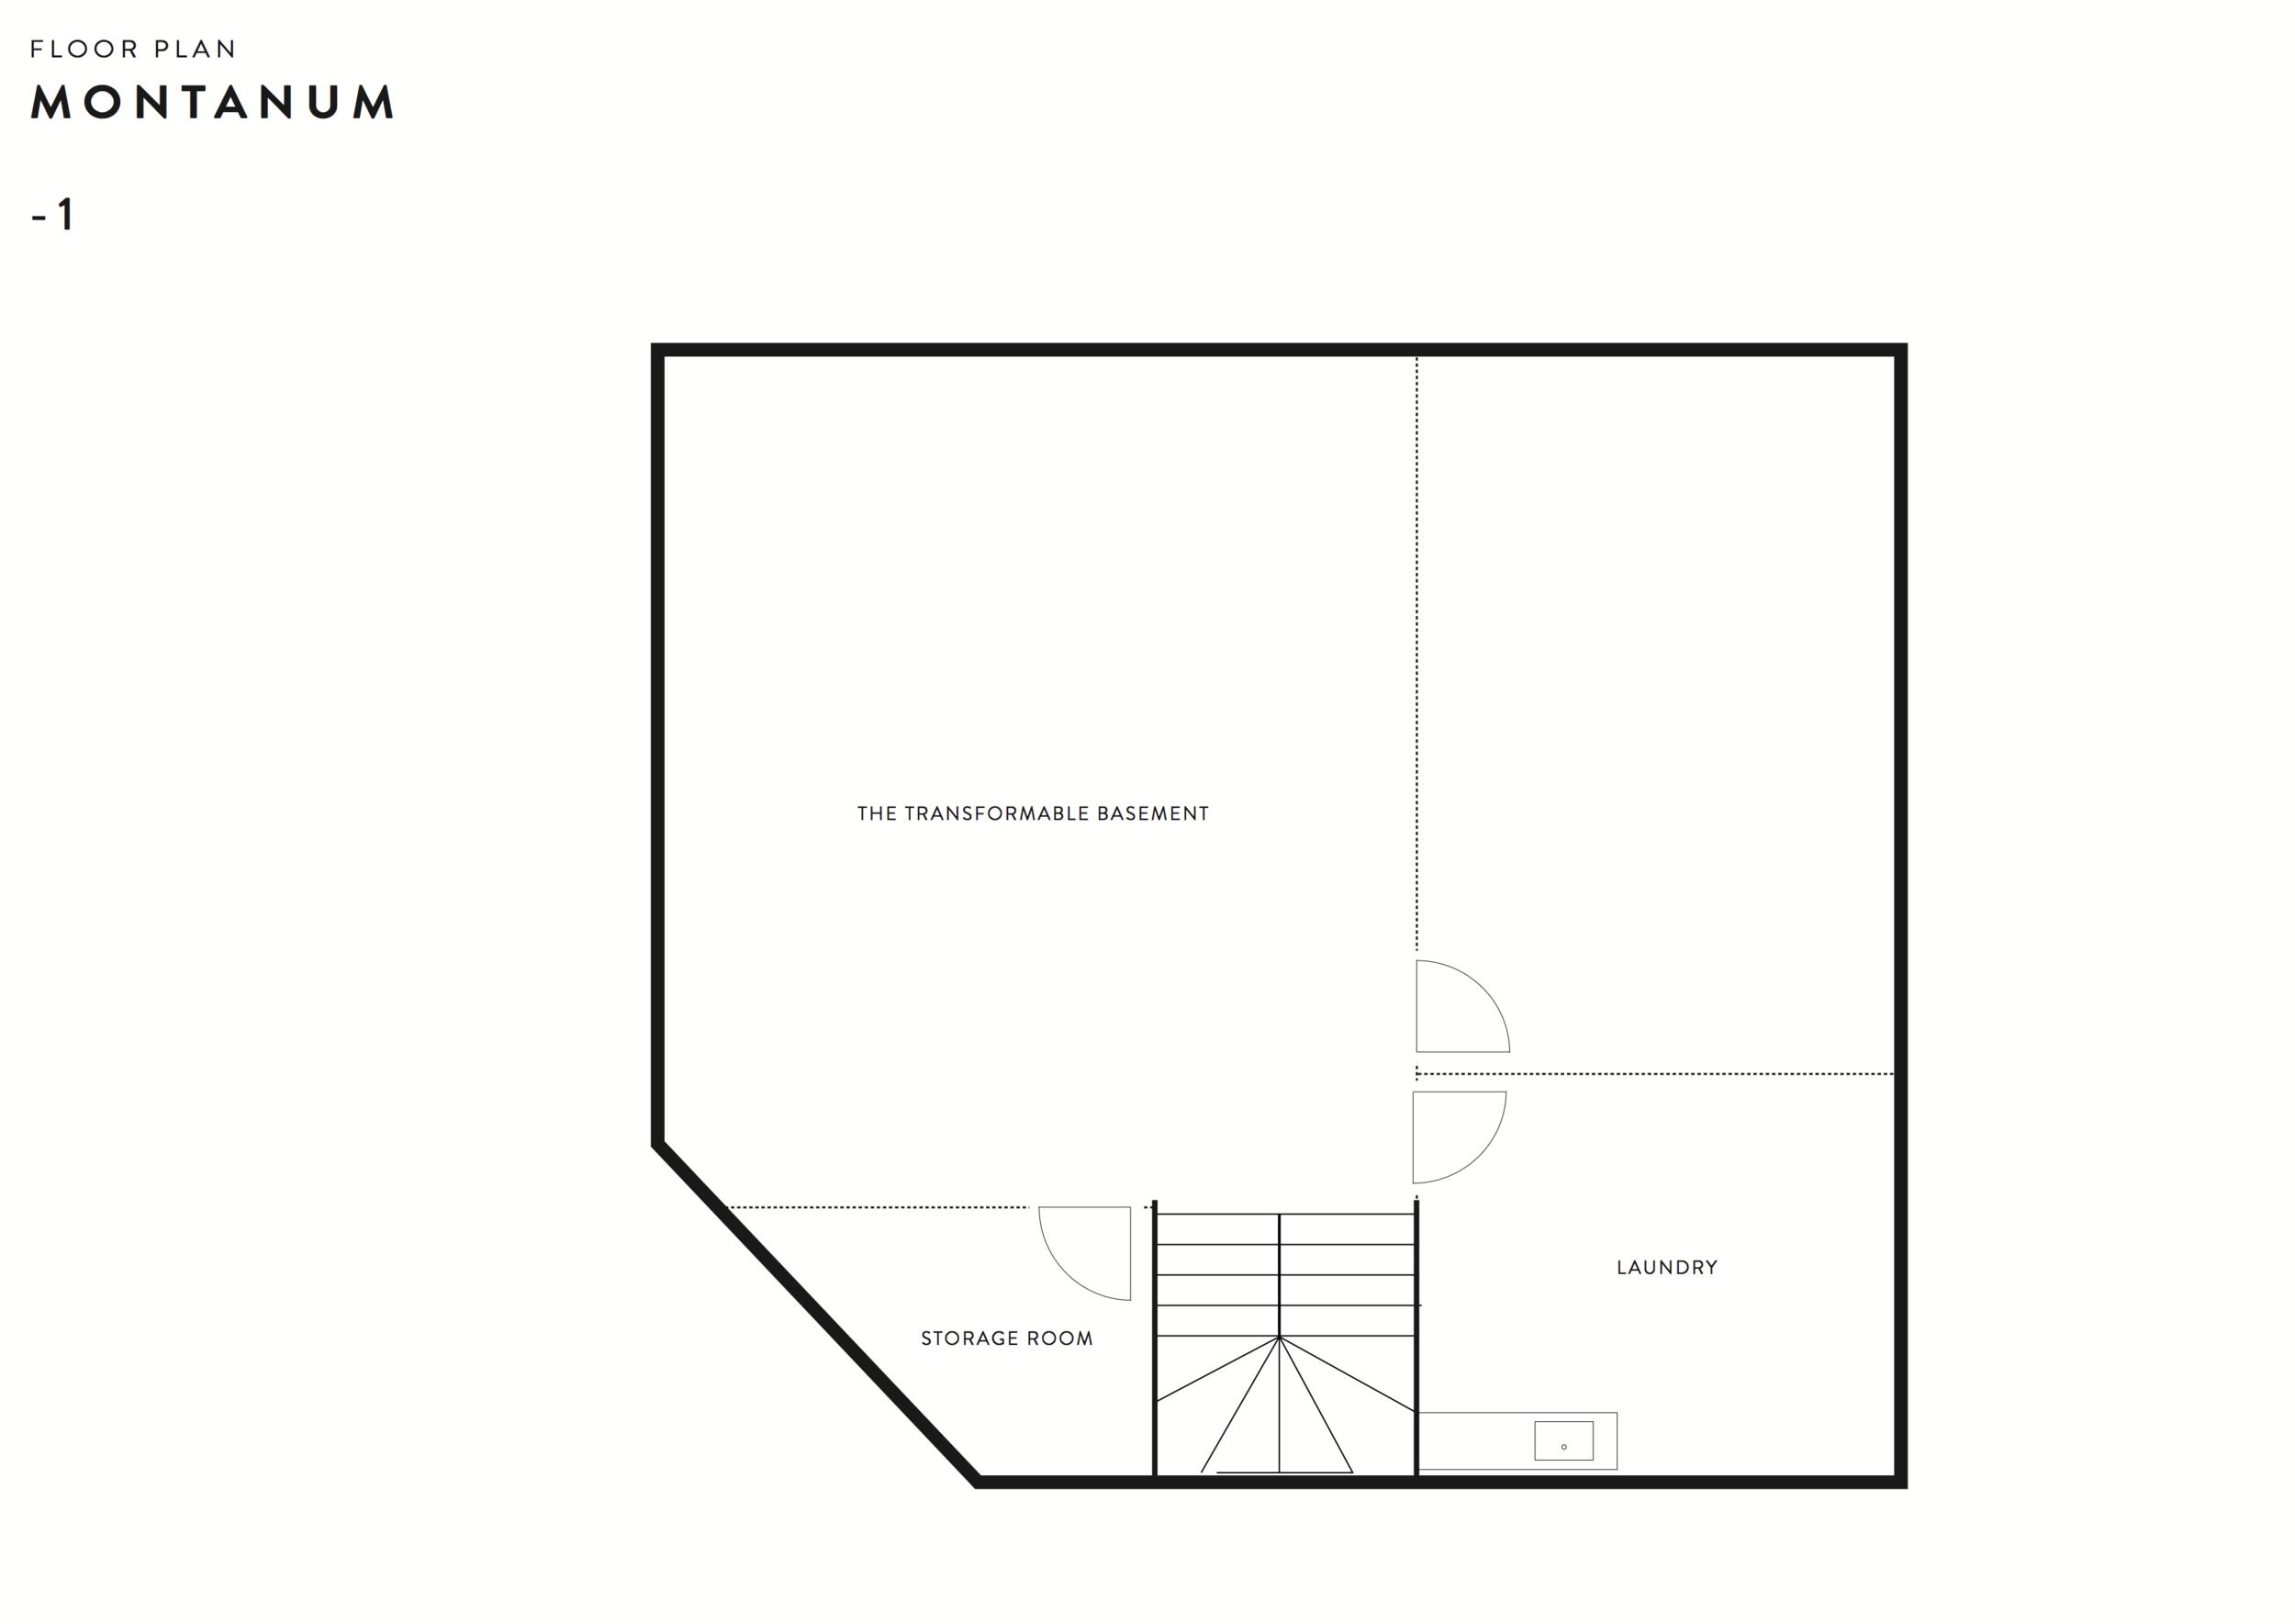 montanum-floor-plan-bumper-real-estate-france-courchevel-1.png